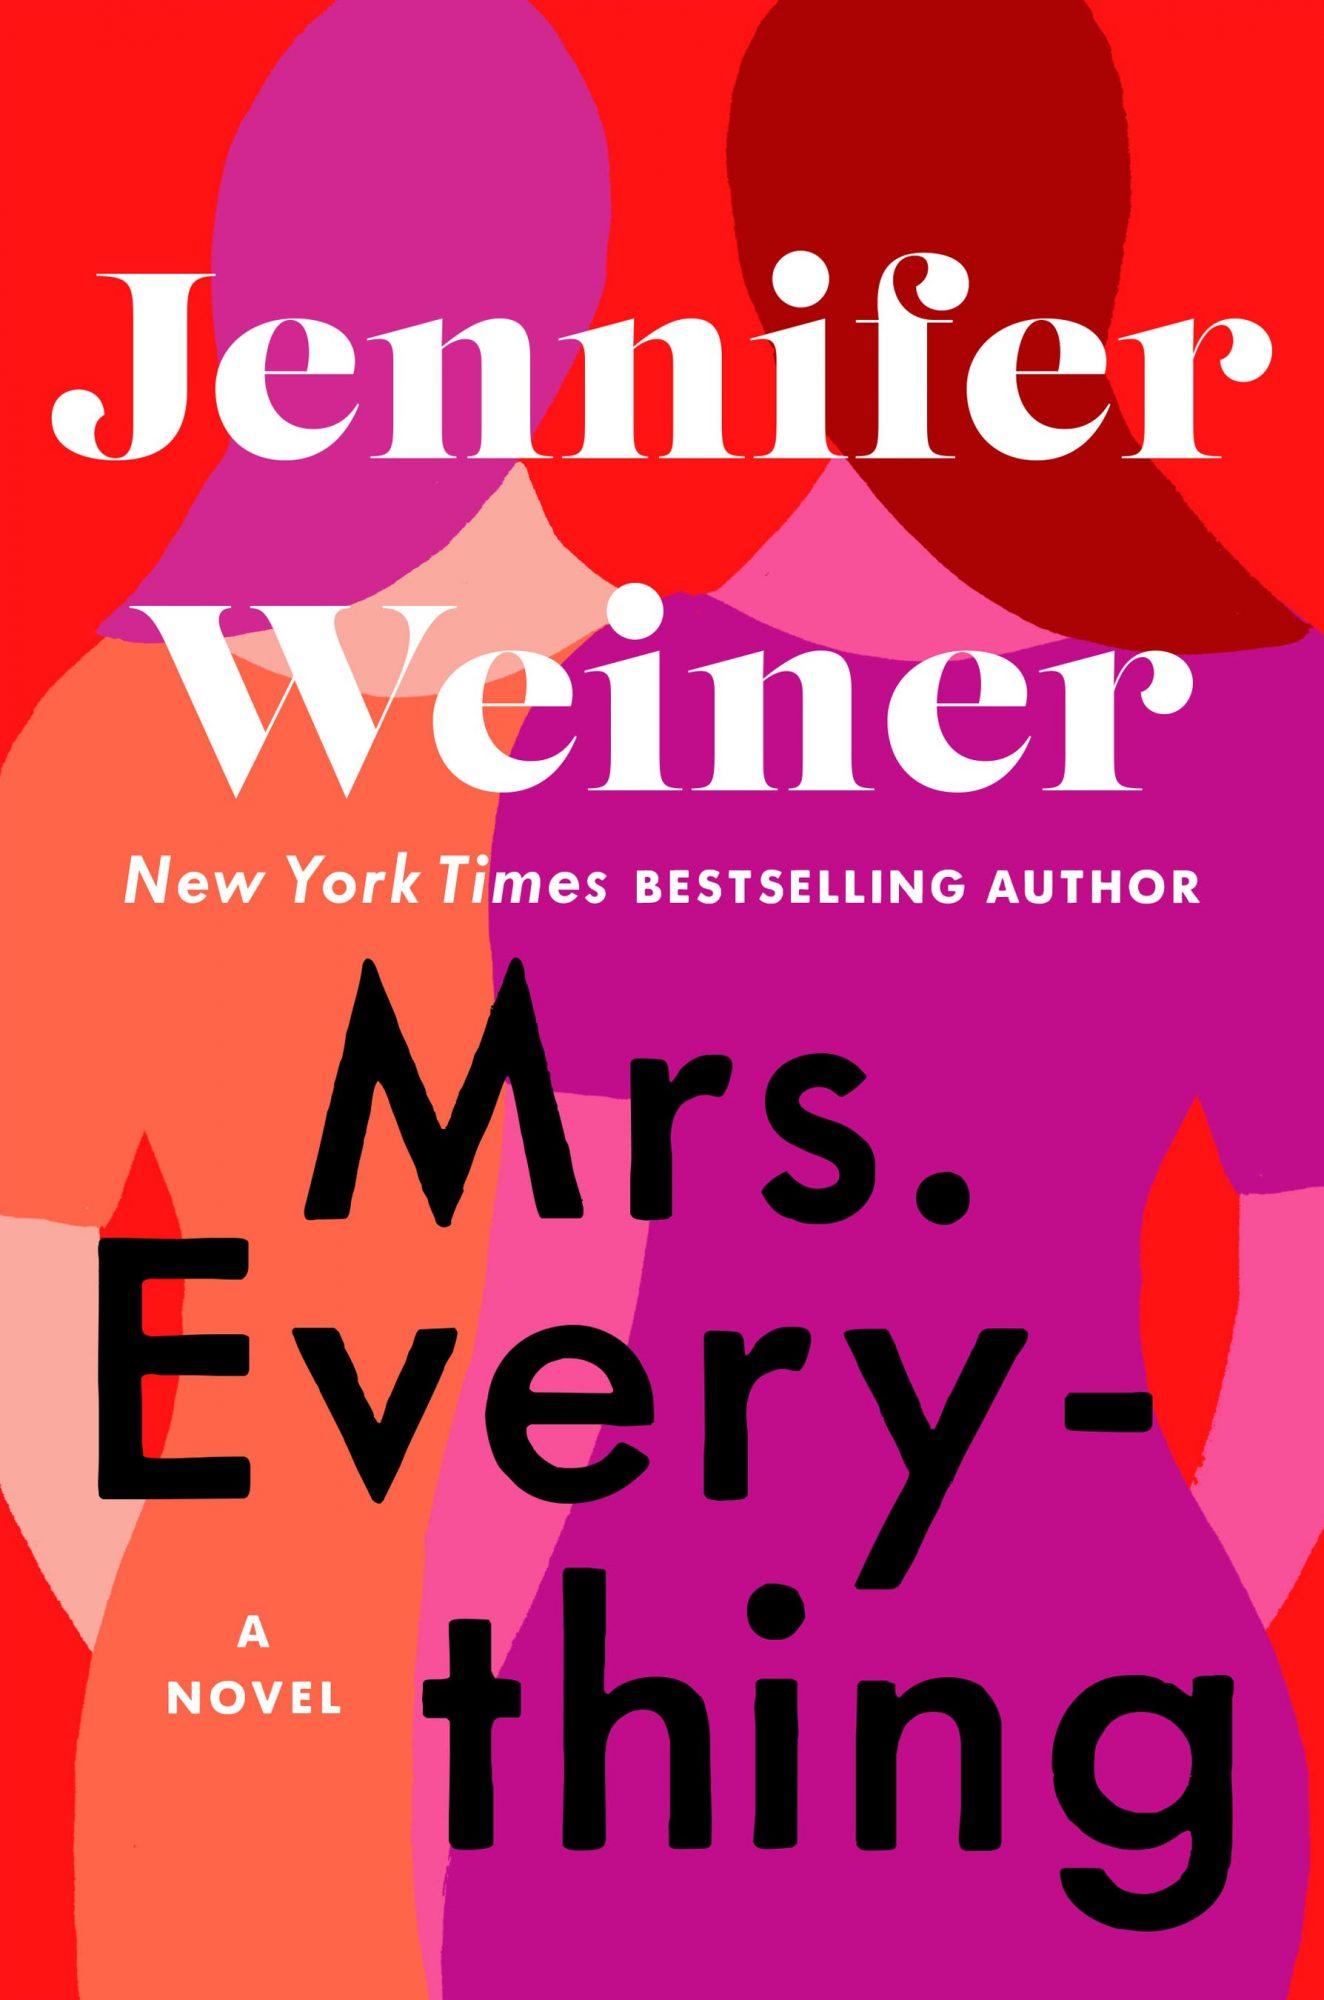 Mrs. Everything (2019)Author: Jennifer Weiner